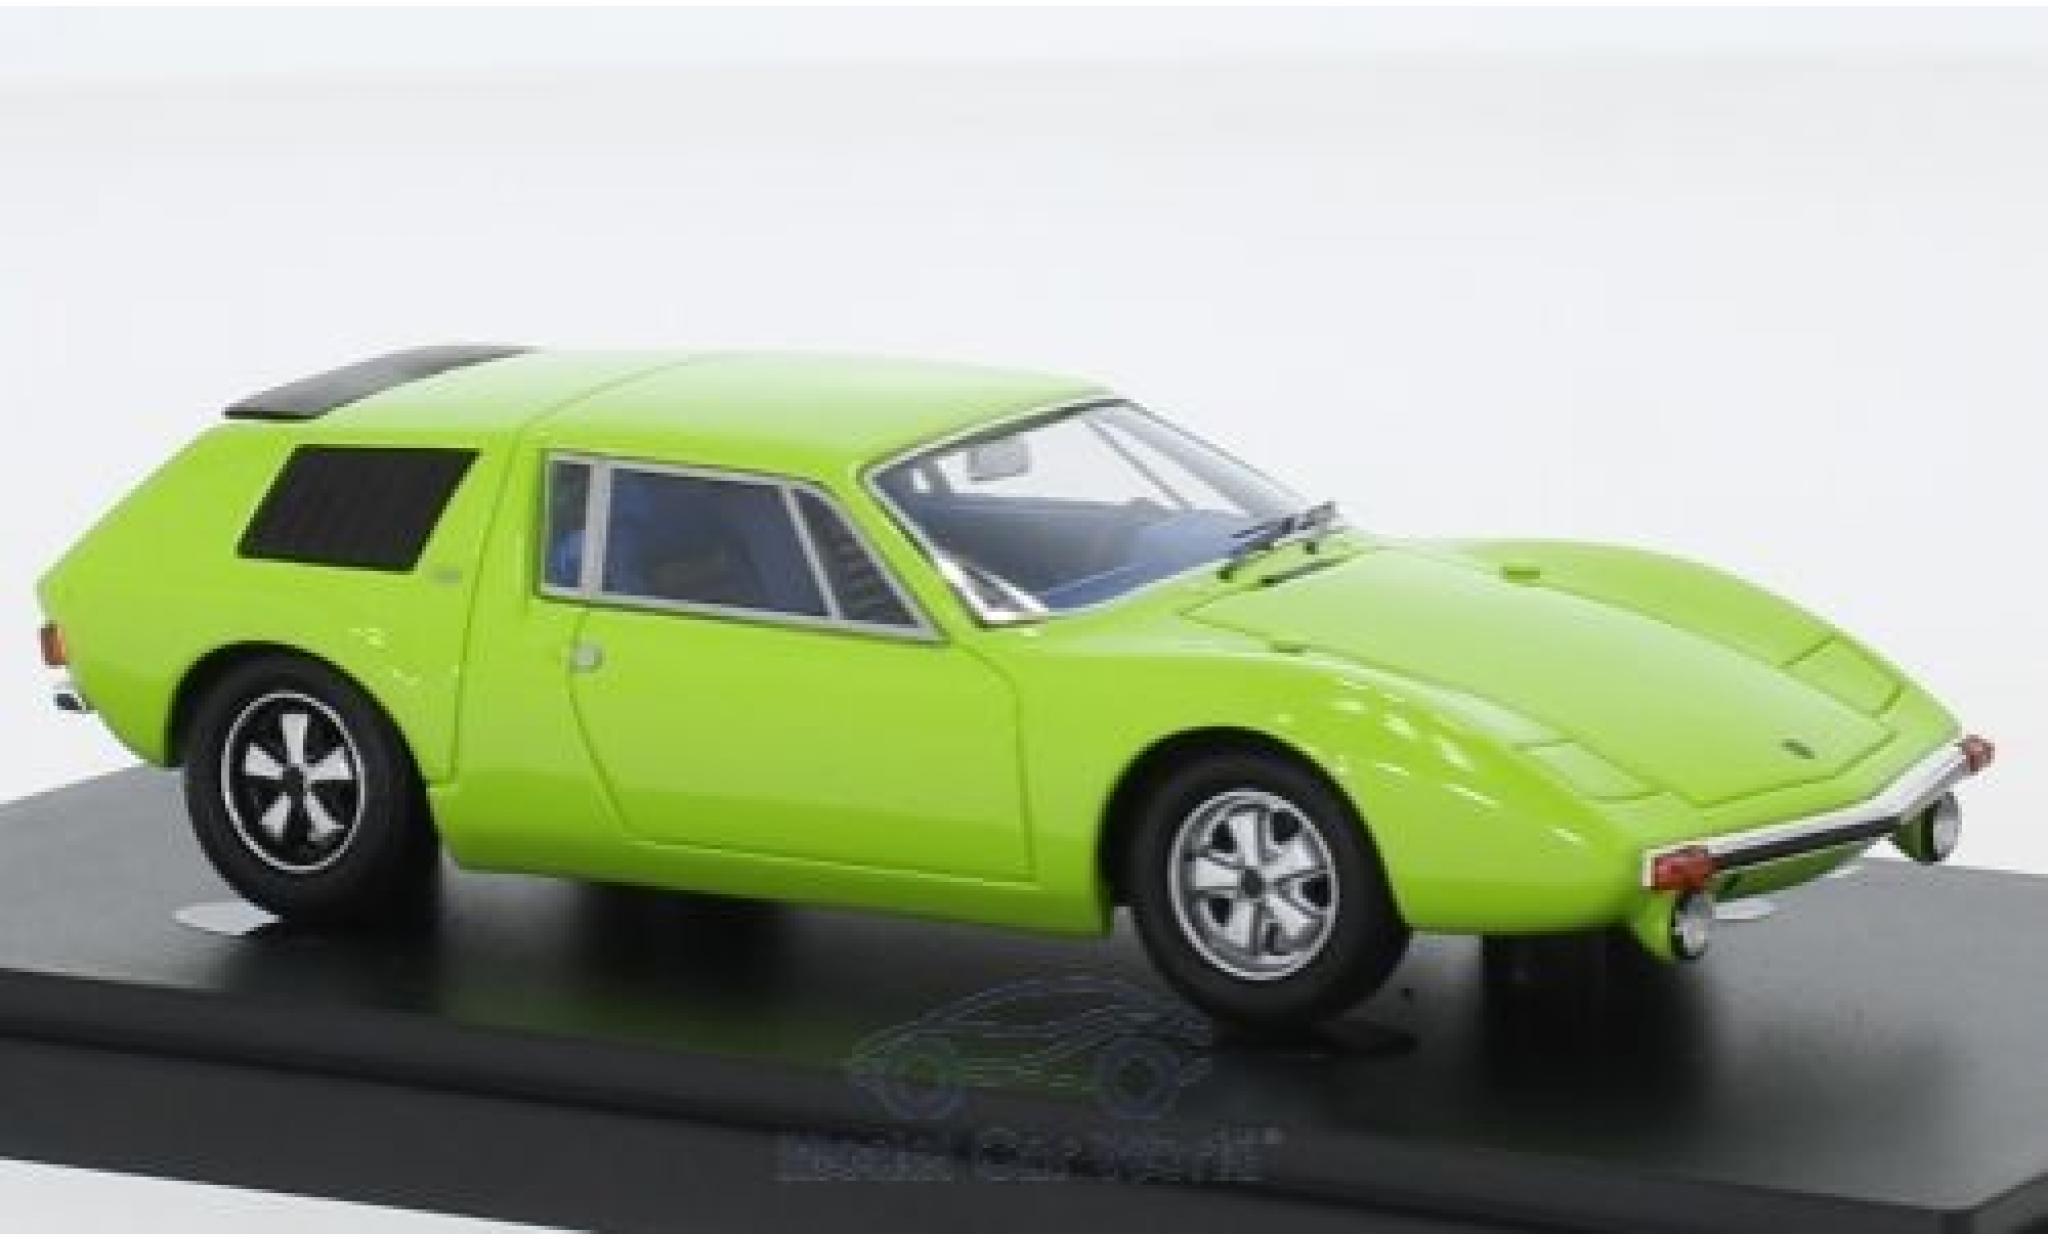 Porsche 914 1/43 AutoCult /6 Graf Goertz verte 1970